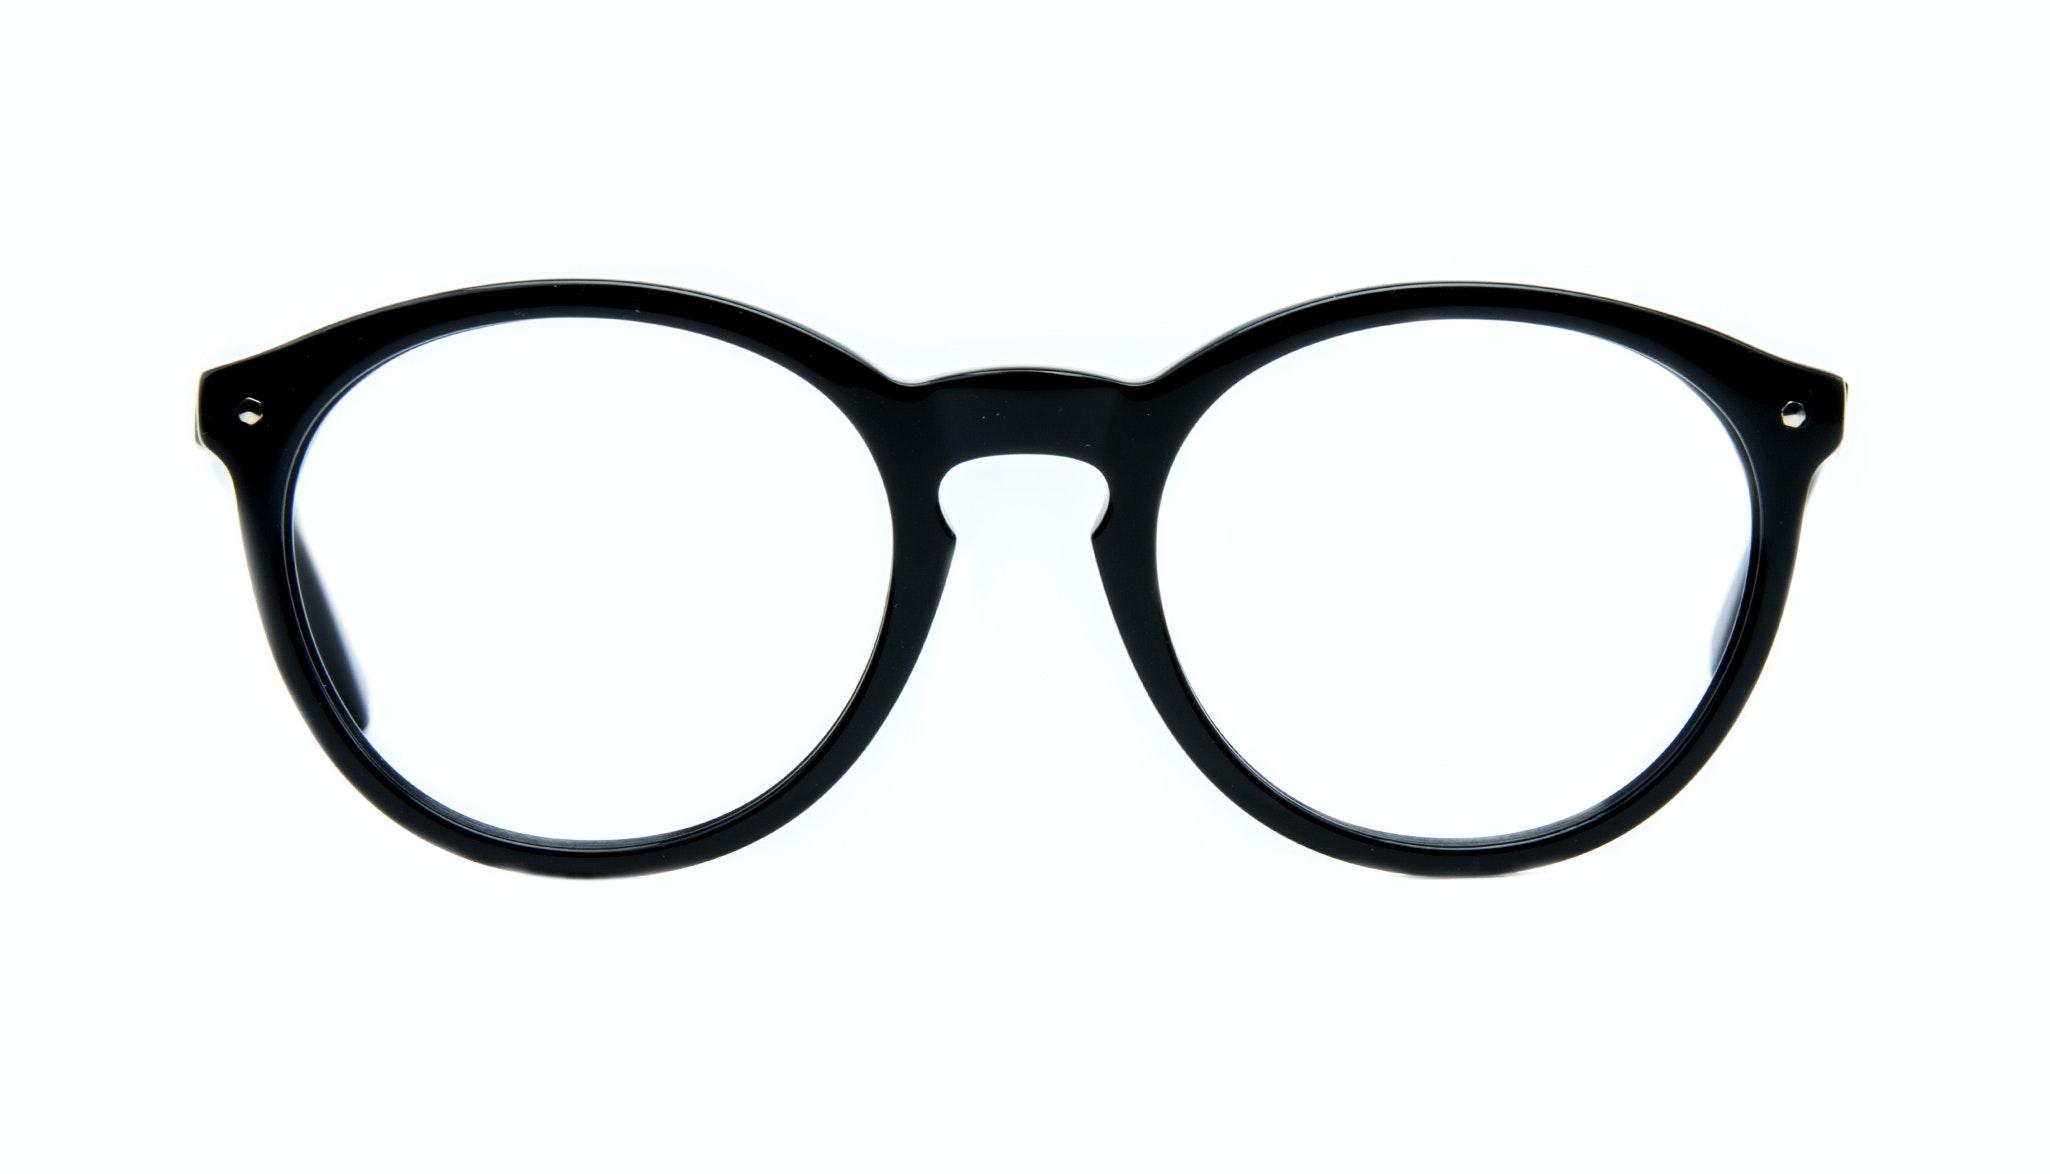 Affordable Fashion Glasses Round Eyeglasses Women Glow Onyx Front